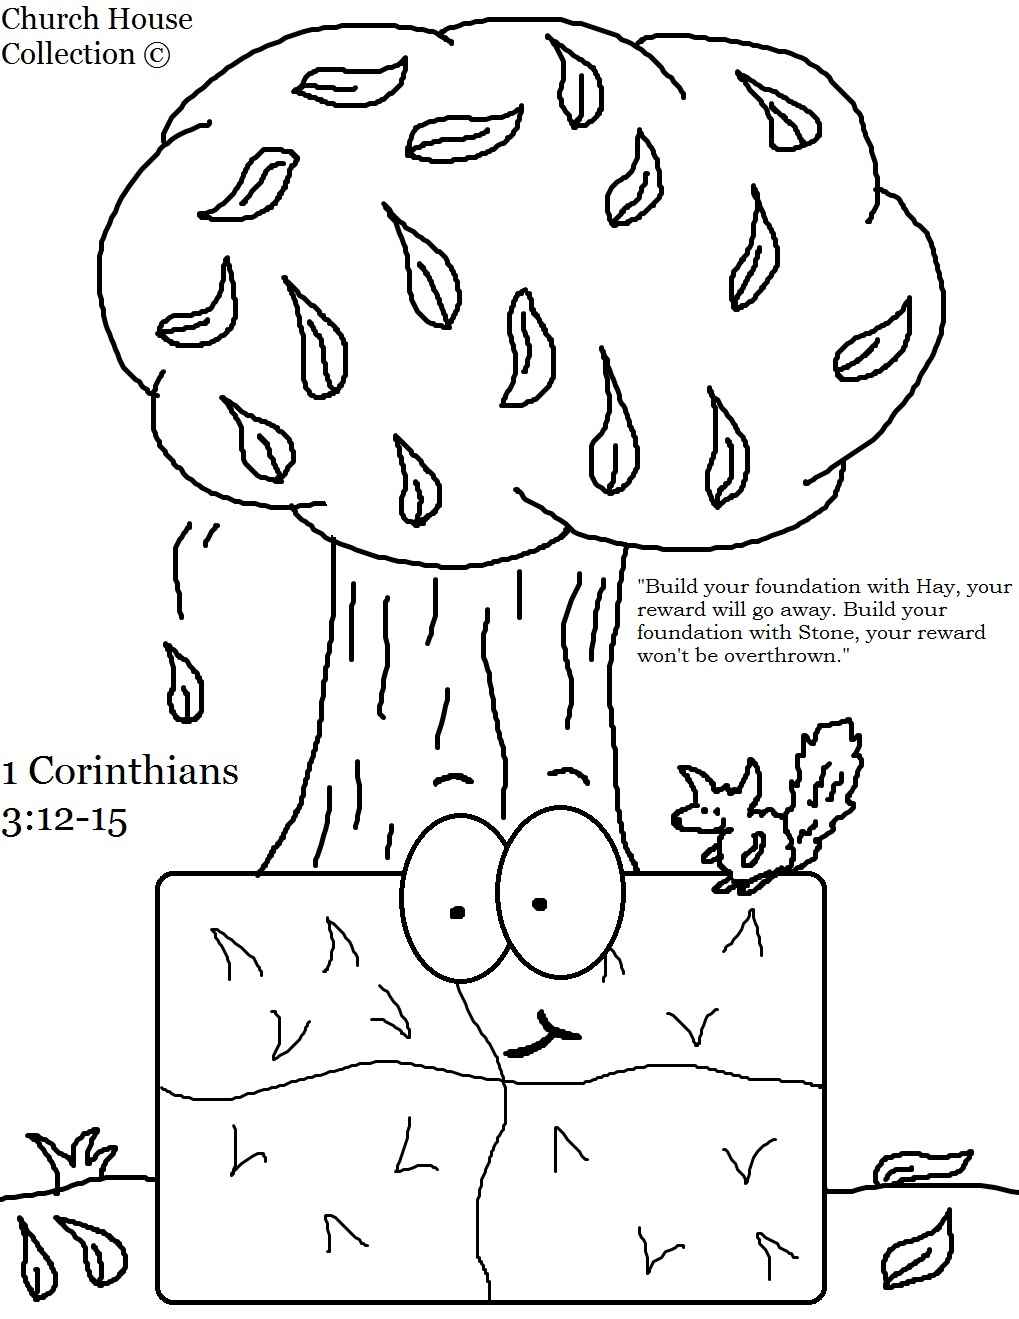 church house collection blog september 2013